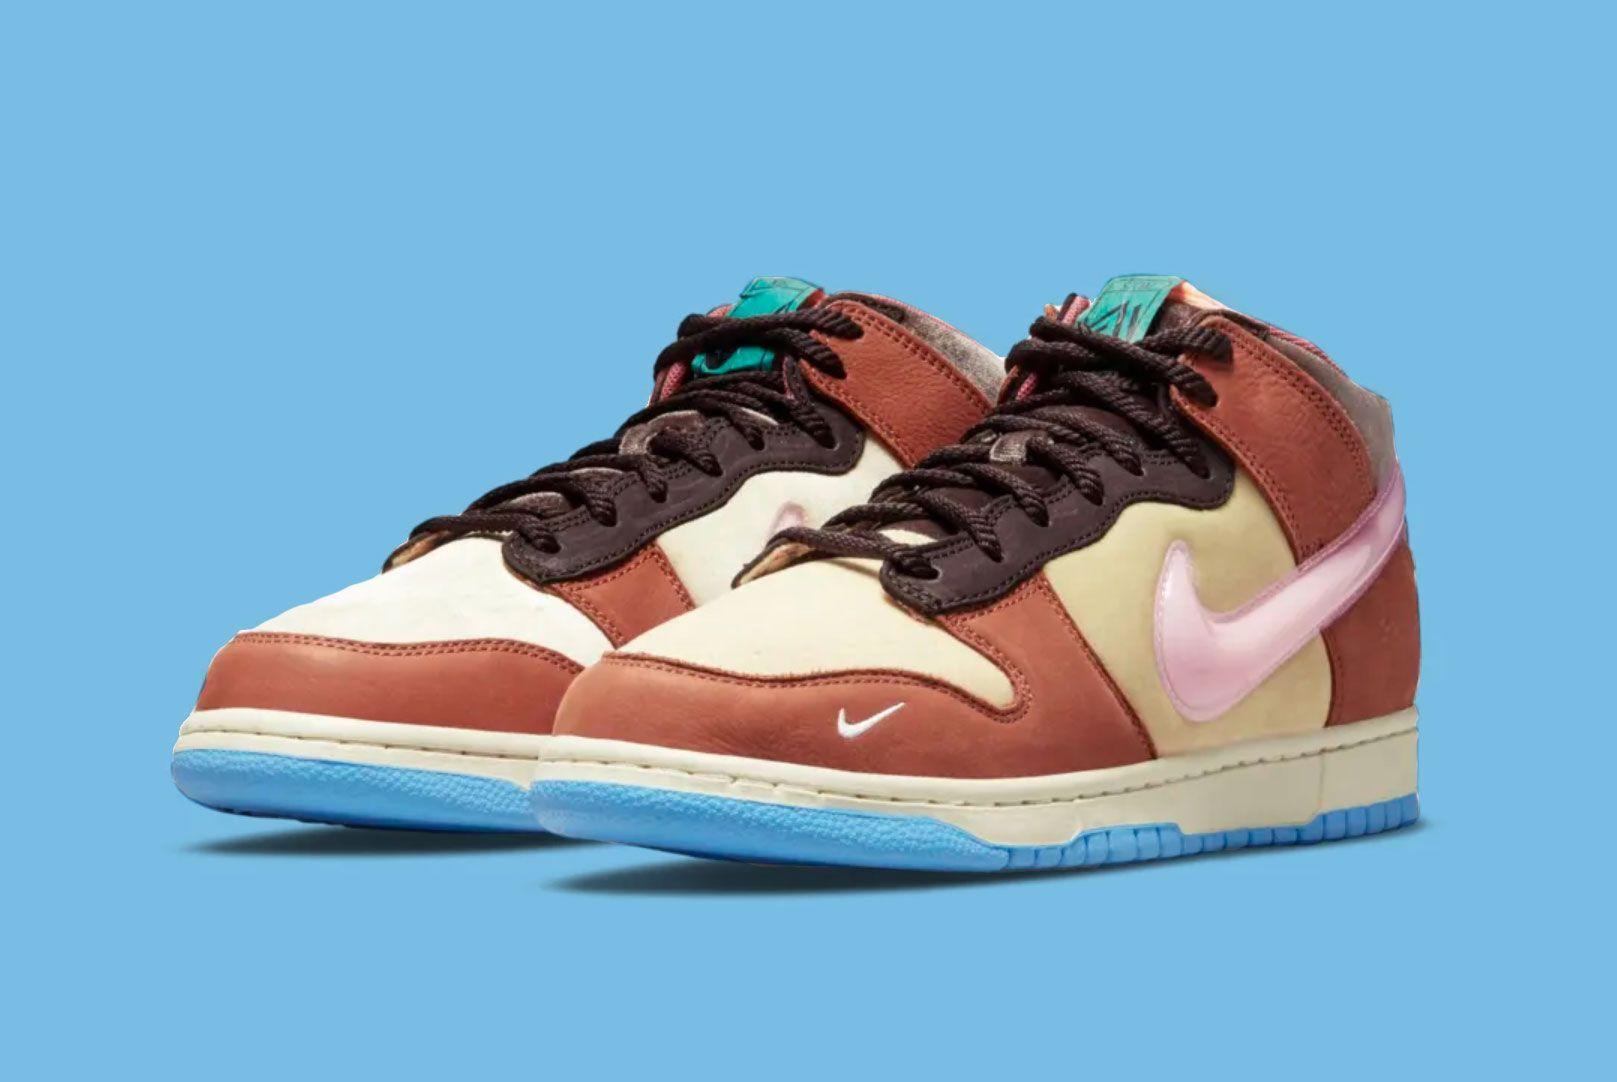 Social Status x Nike Dunk 'Chocolate Milk'